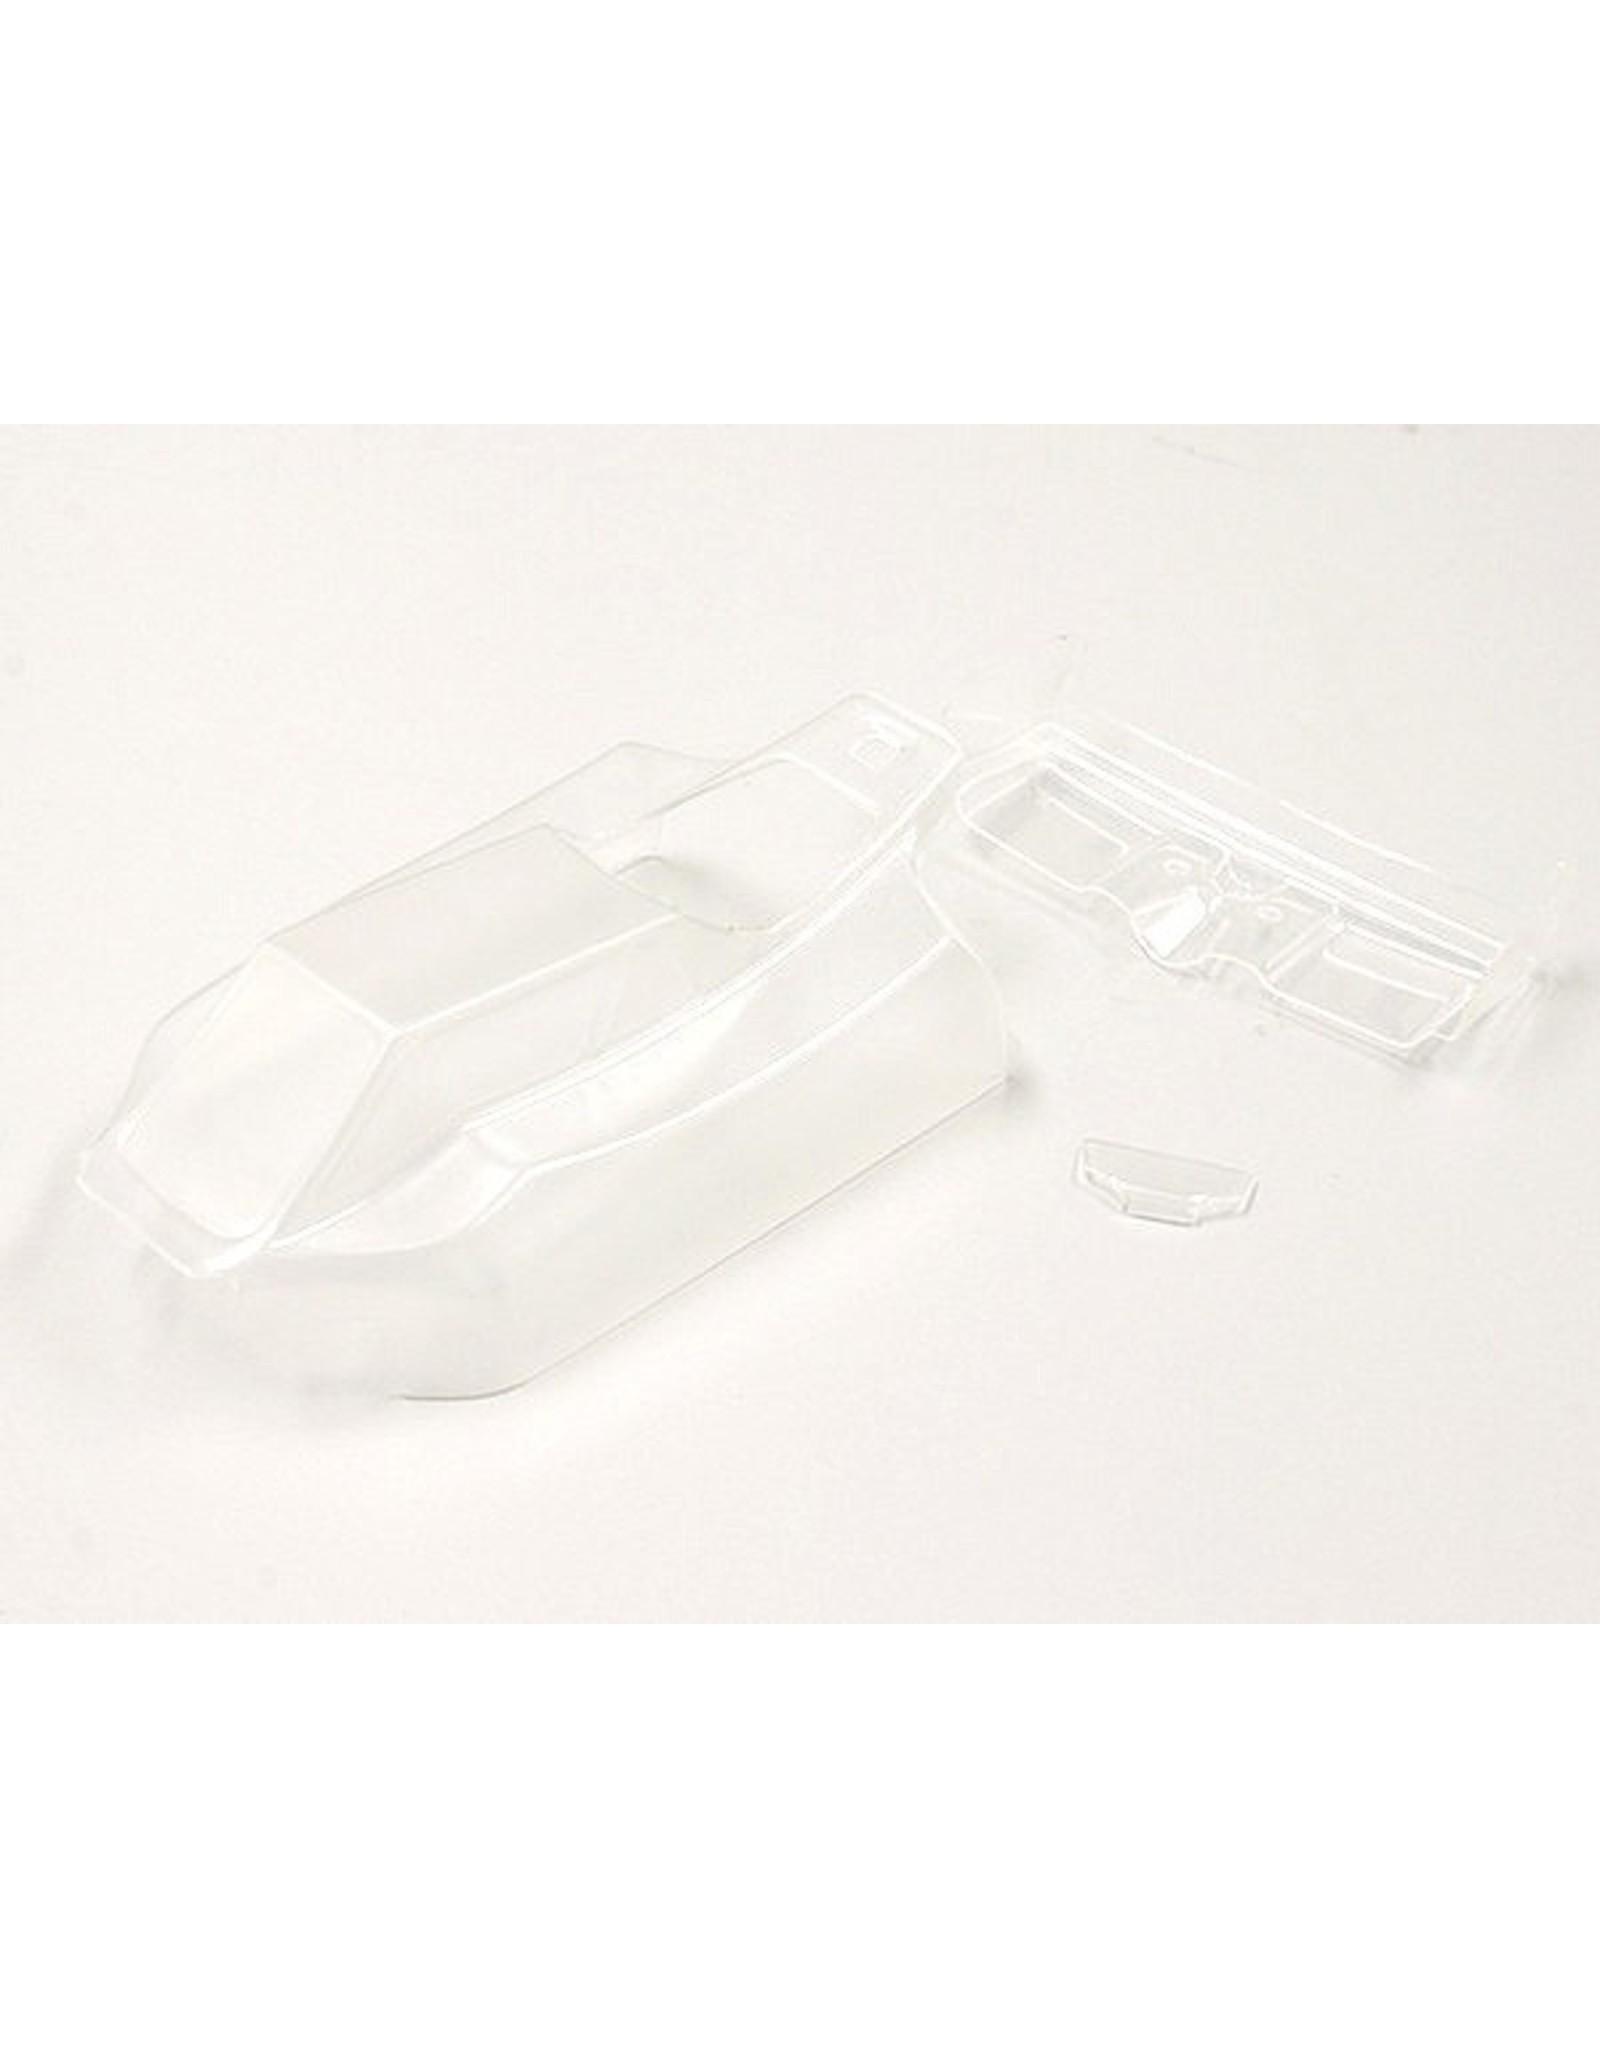 Kyosho Clear Body Set(LAZER ZX6)  (MBB08)